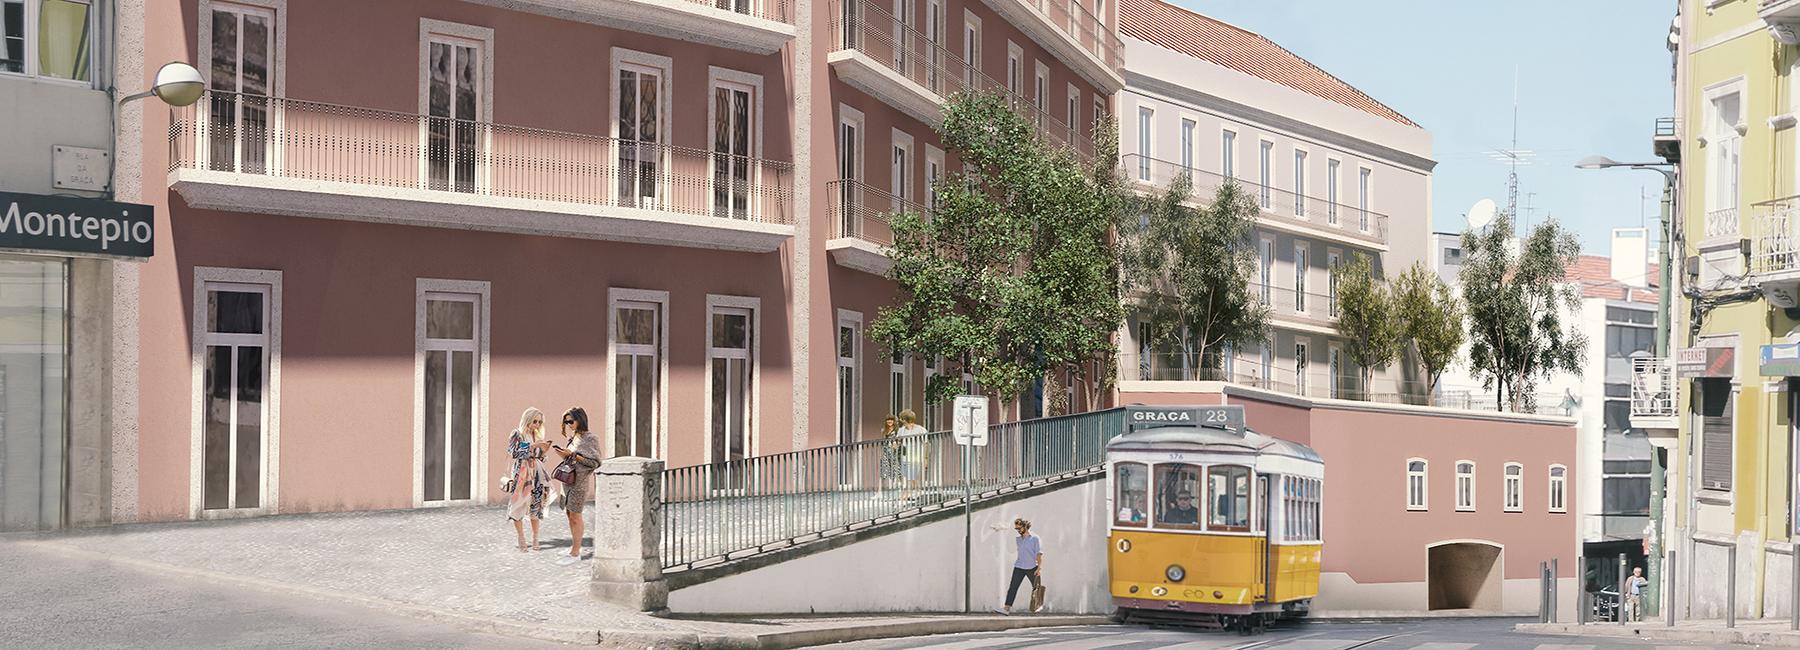 <a href='/empreendimento/graca-residences-lisboa/?emp=7212597' target=''>Graça Residences</a>